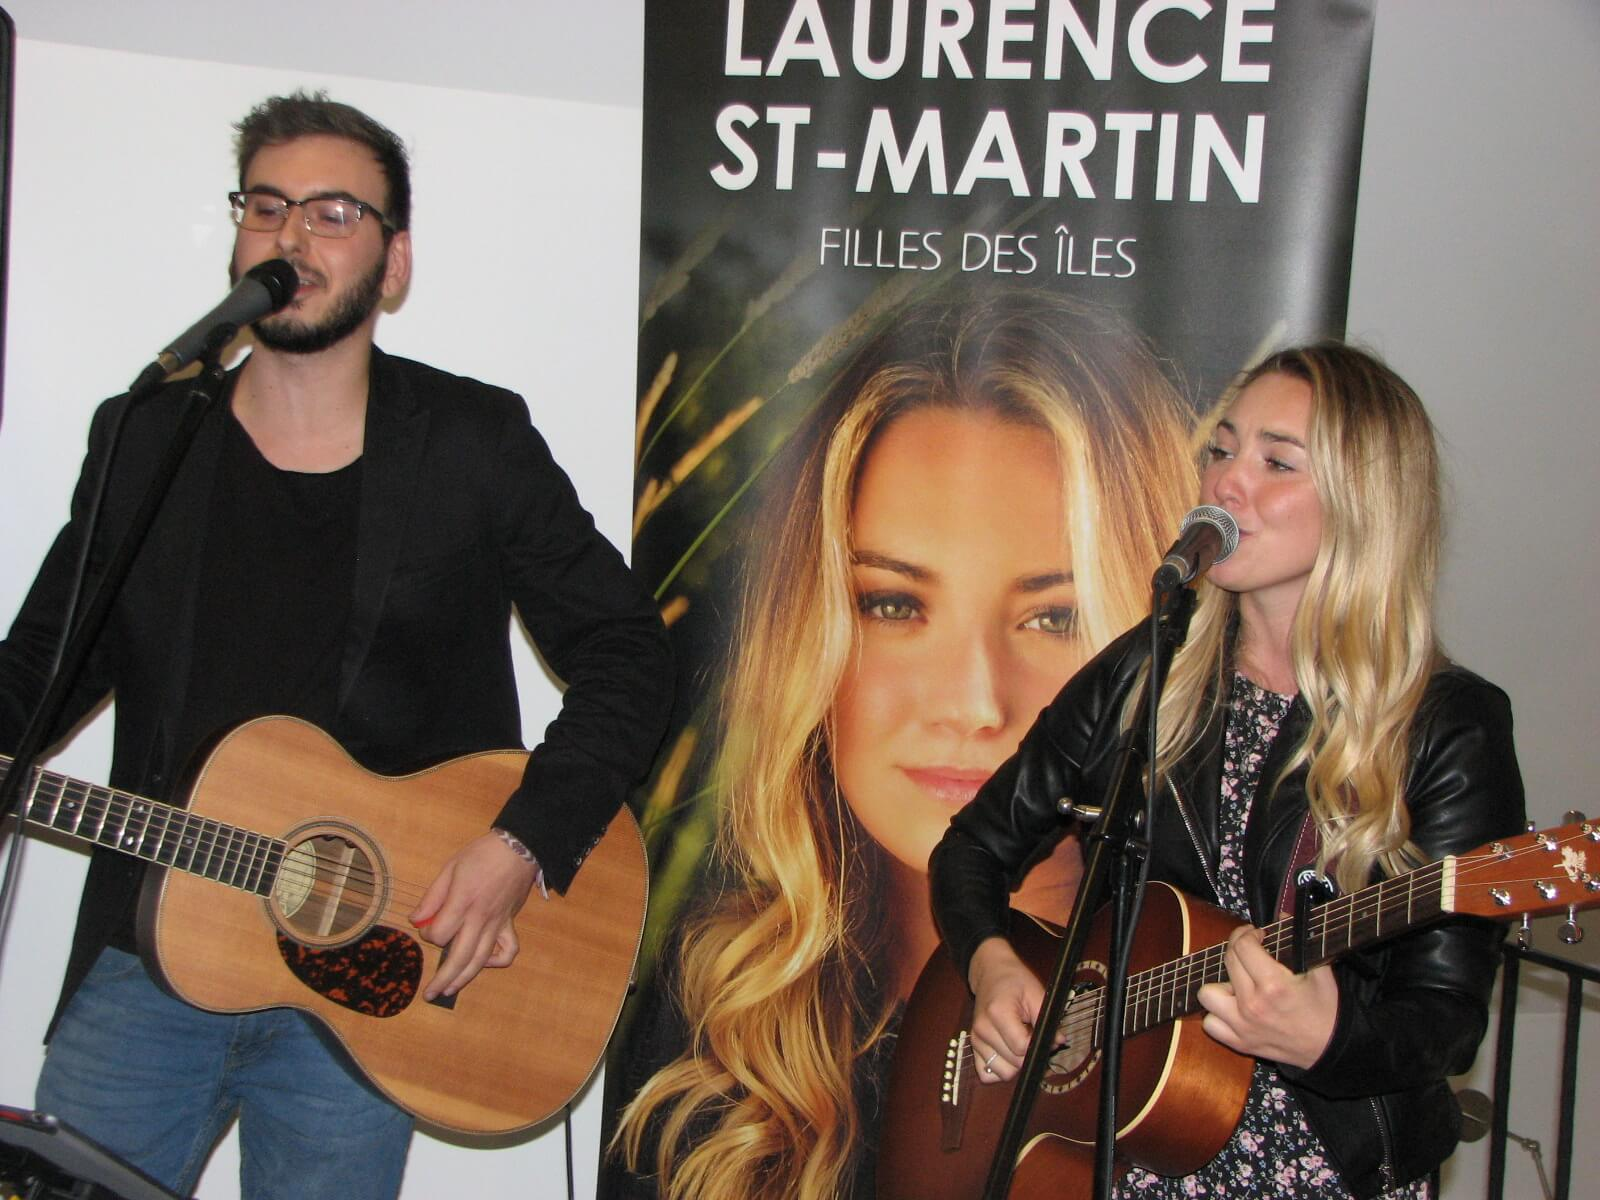 St-Martin Laurence